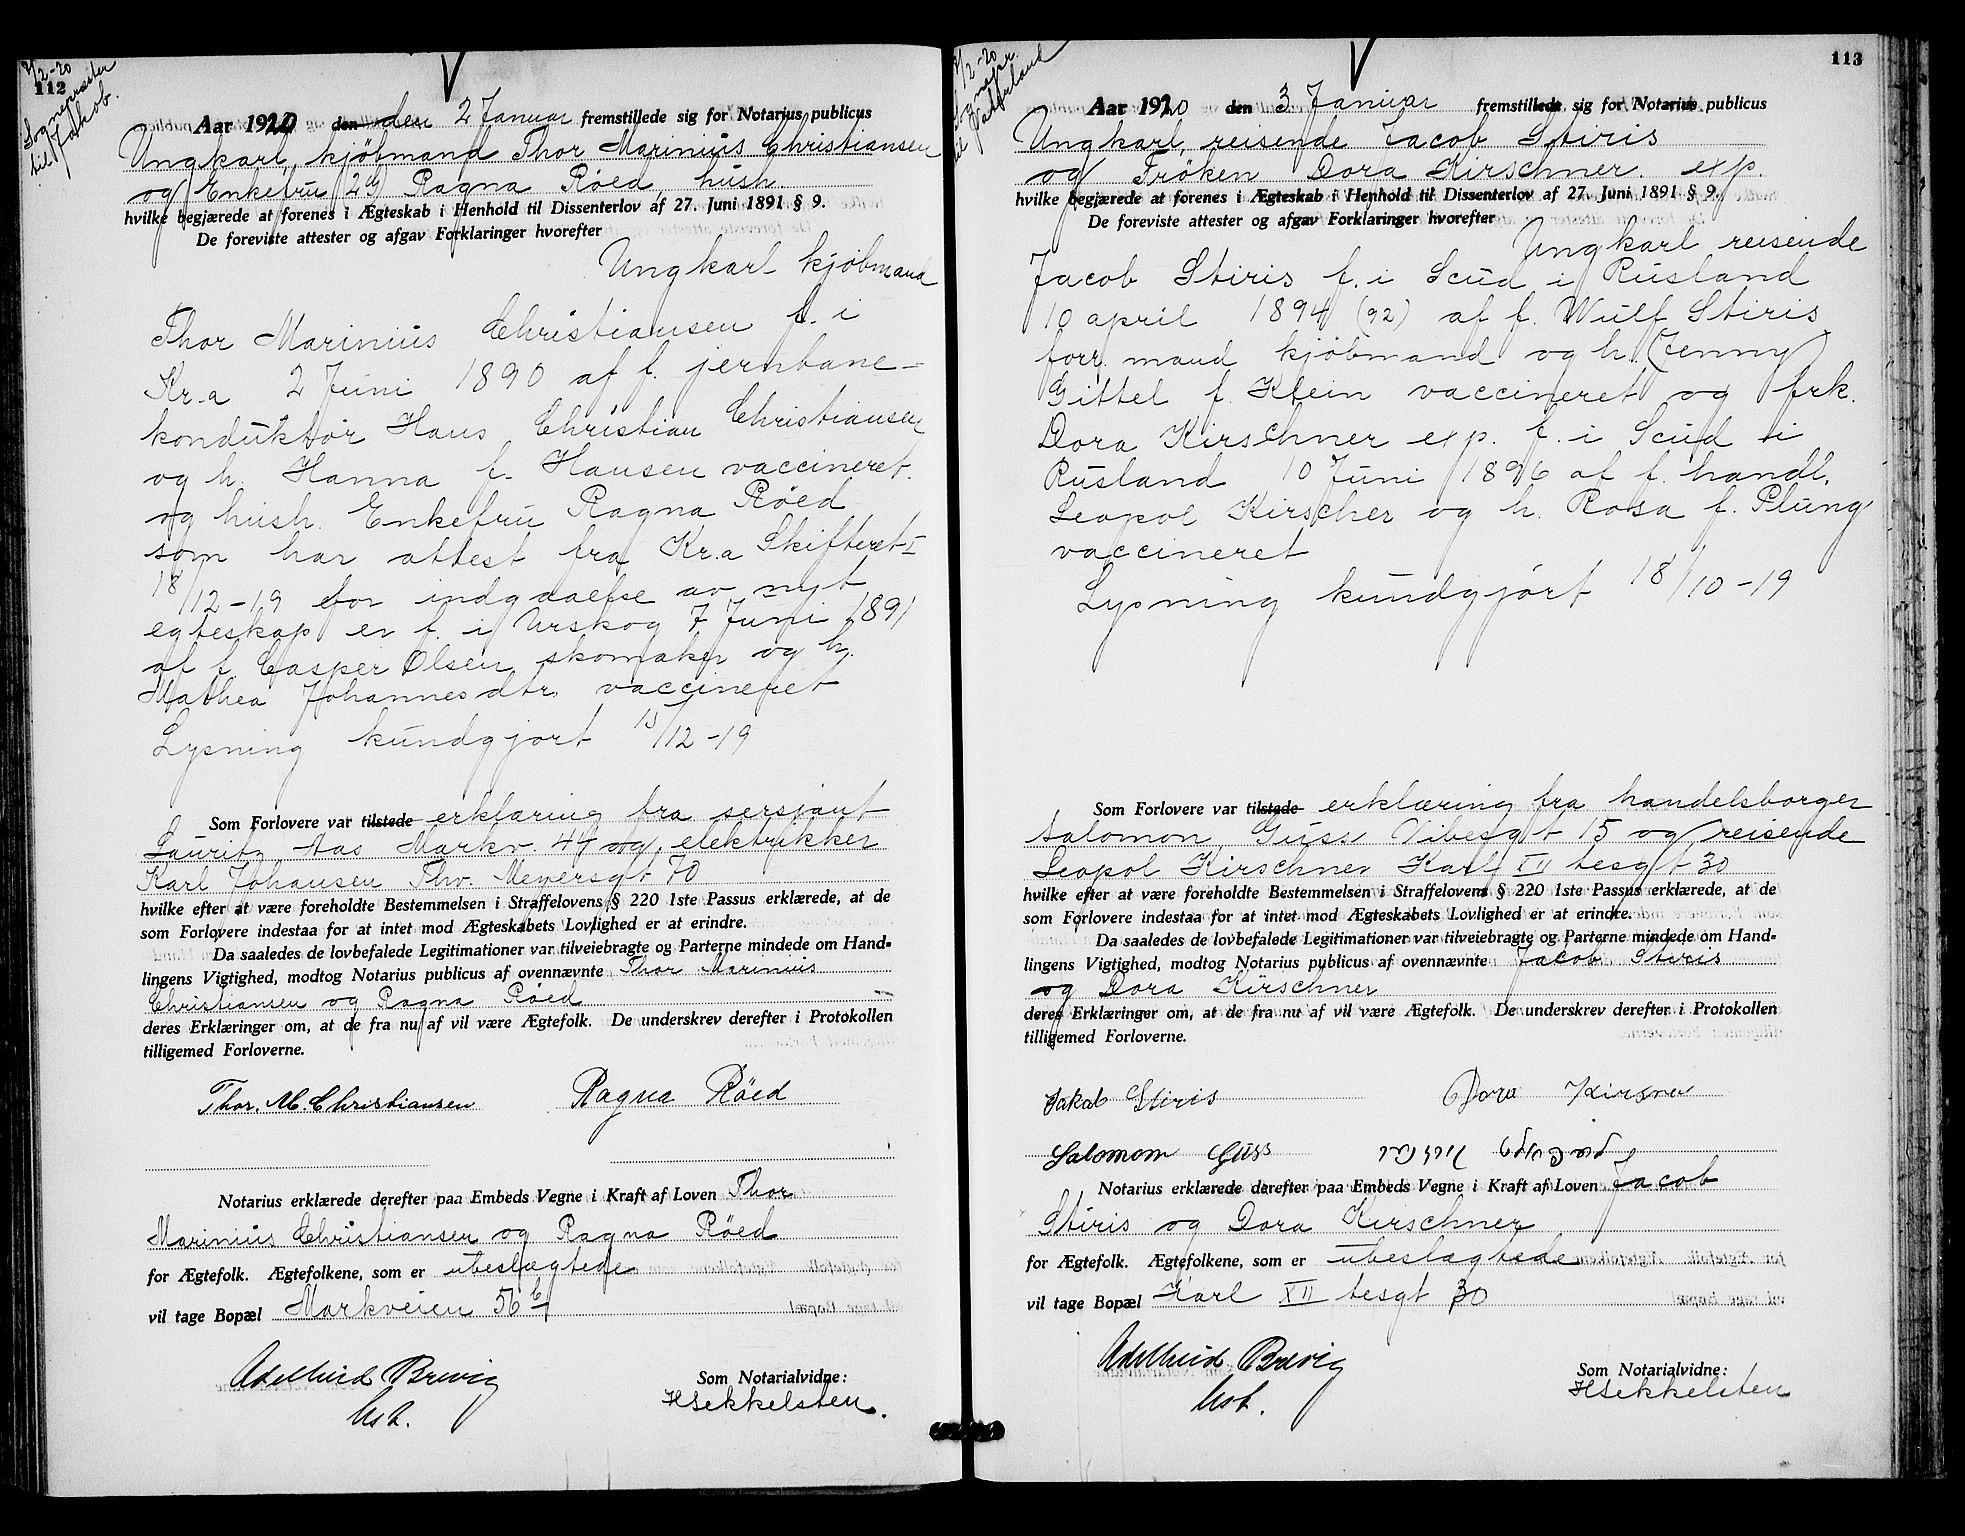 SAO, Oslo byfogd avd. I, L/Lb/Lbb/L0013: Notarialprotokoll, rekke II: Vigsler, 1919-1920, s. 112-113